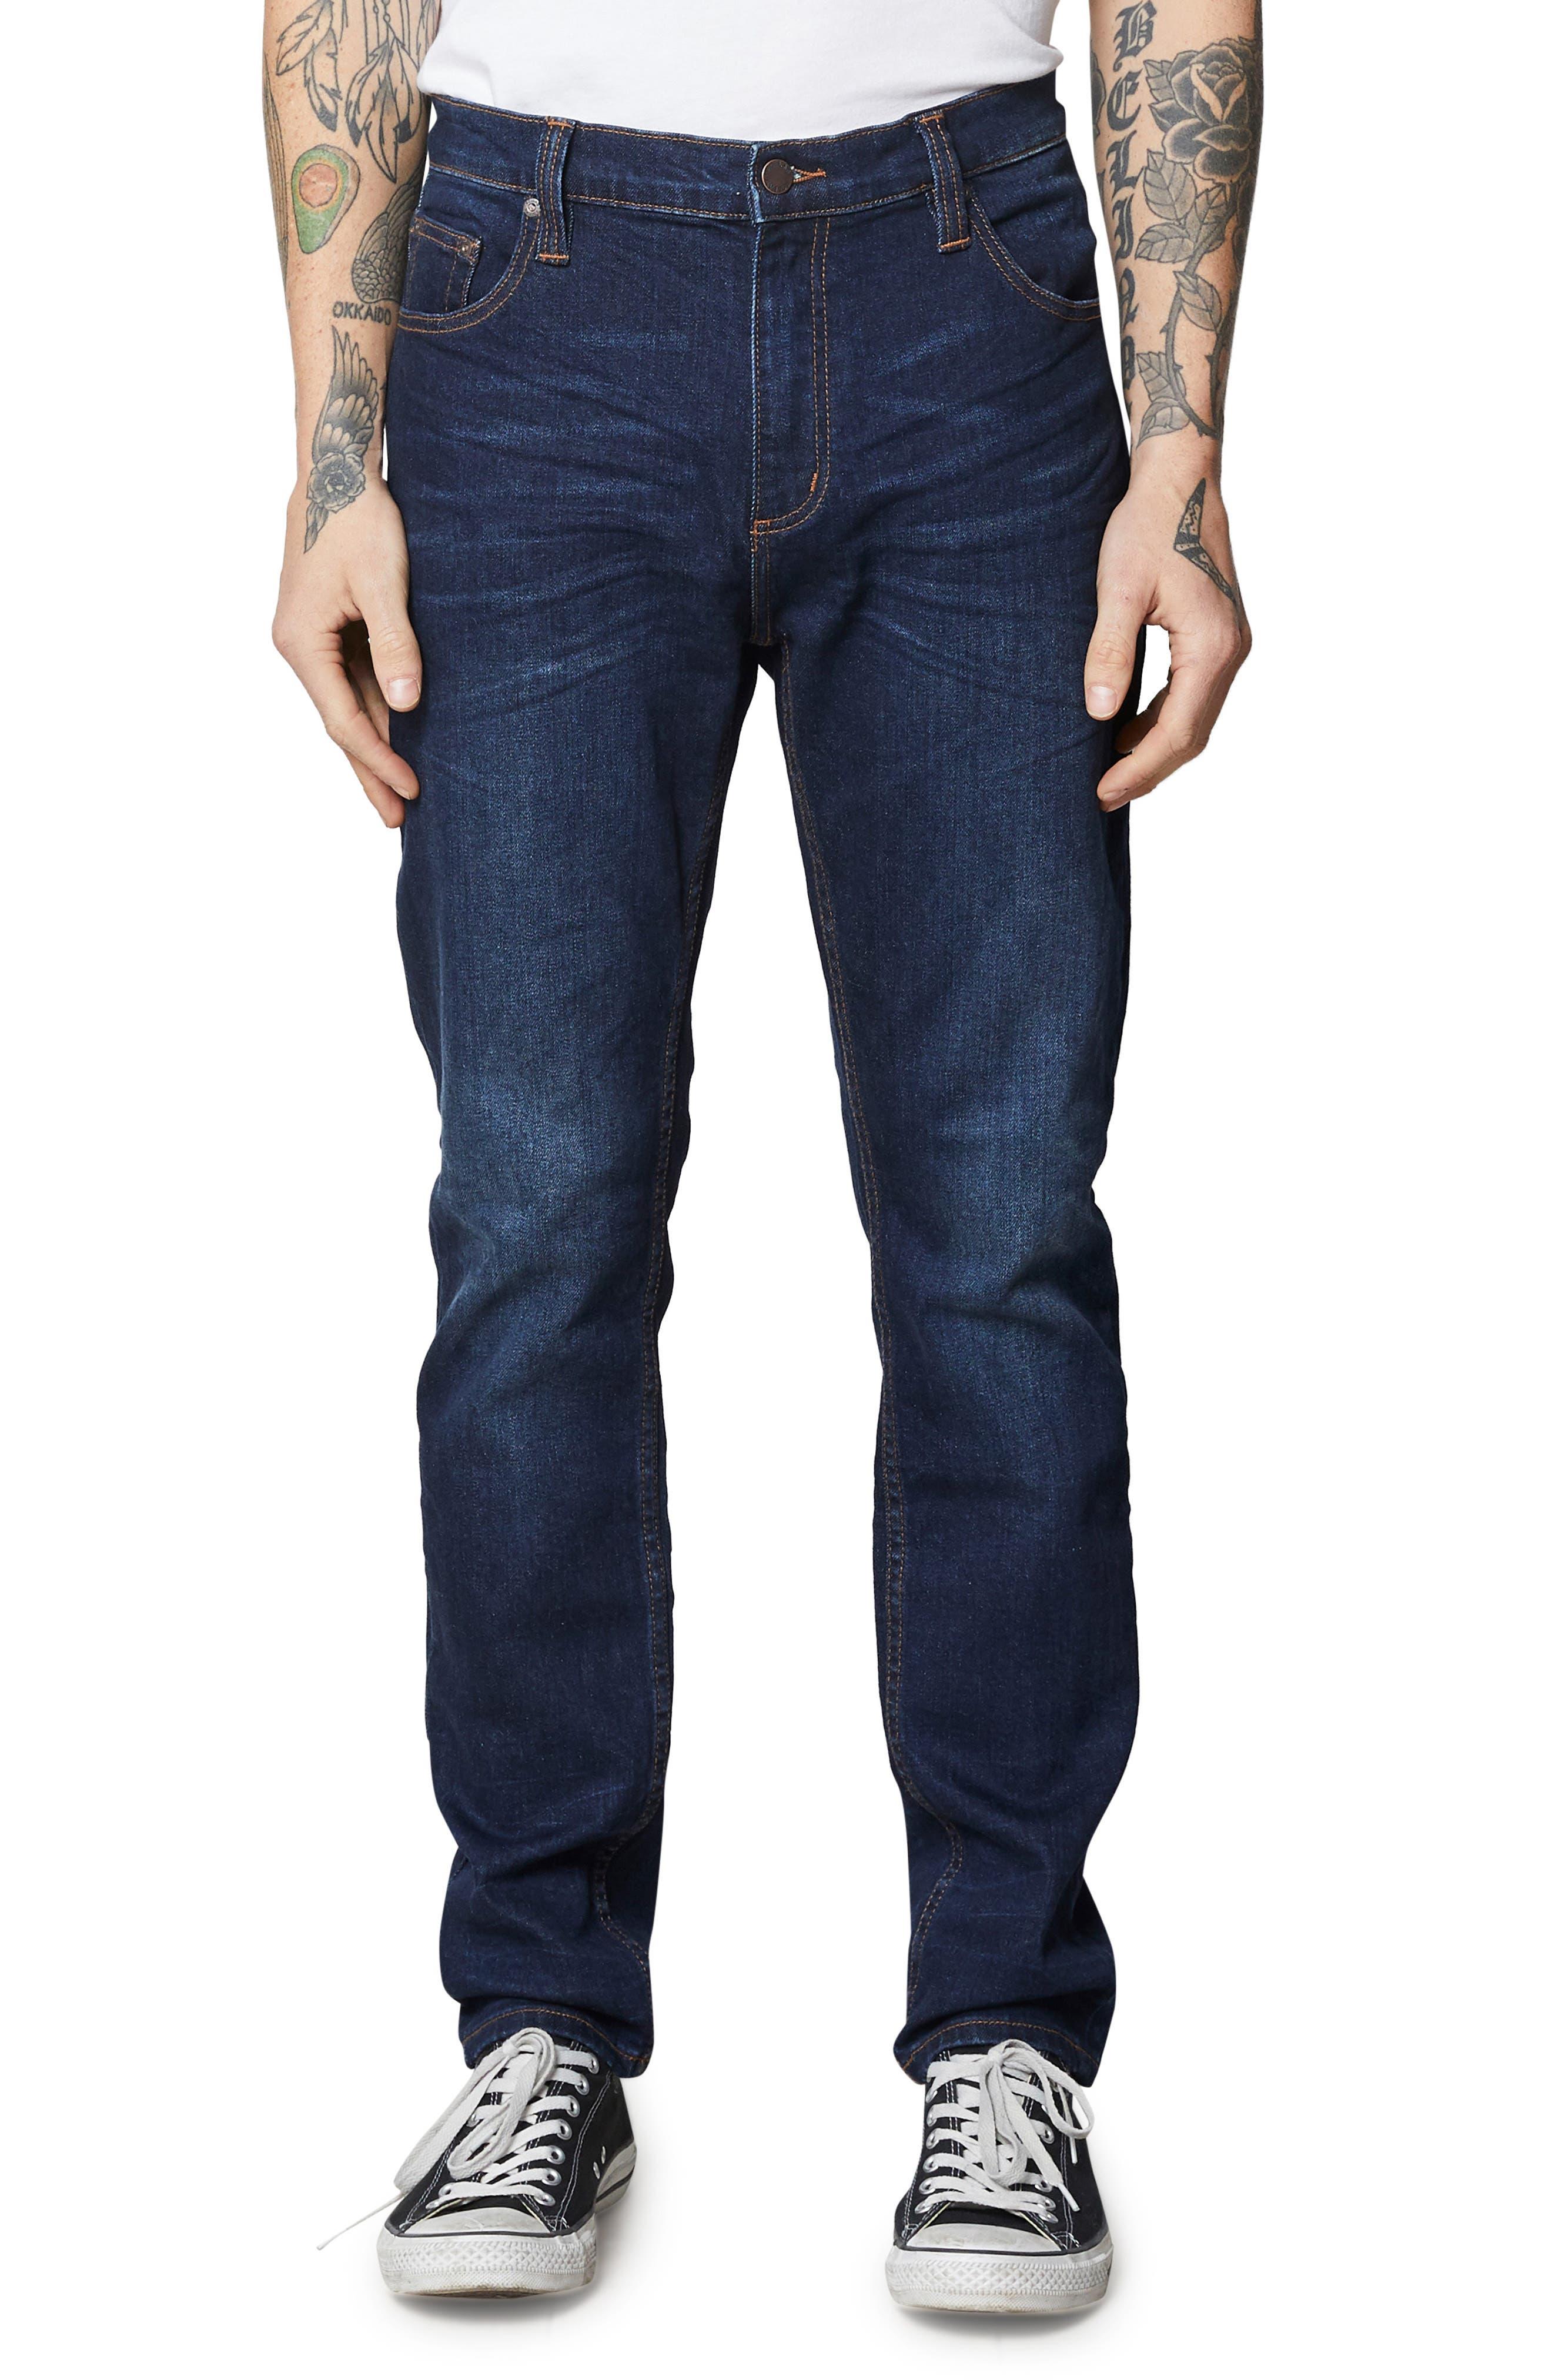 ROLLA'S,                             Tim Slims Slim Fit Jeans,                             Main thumbnail 1, color,                             406